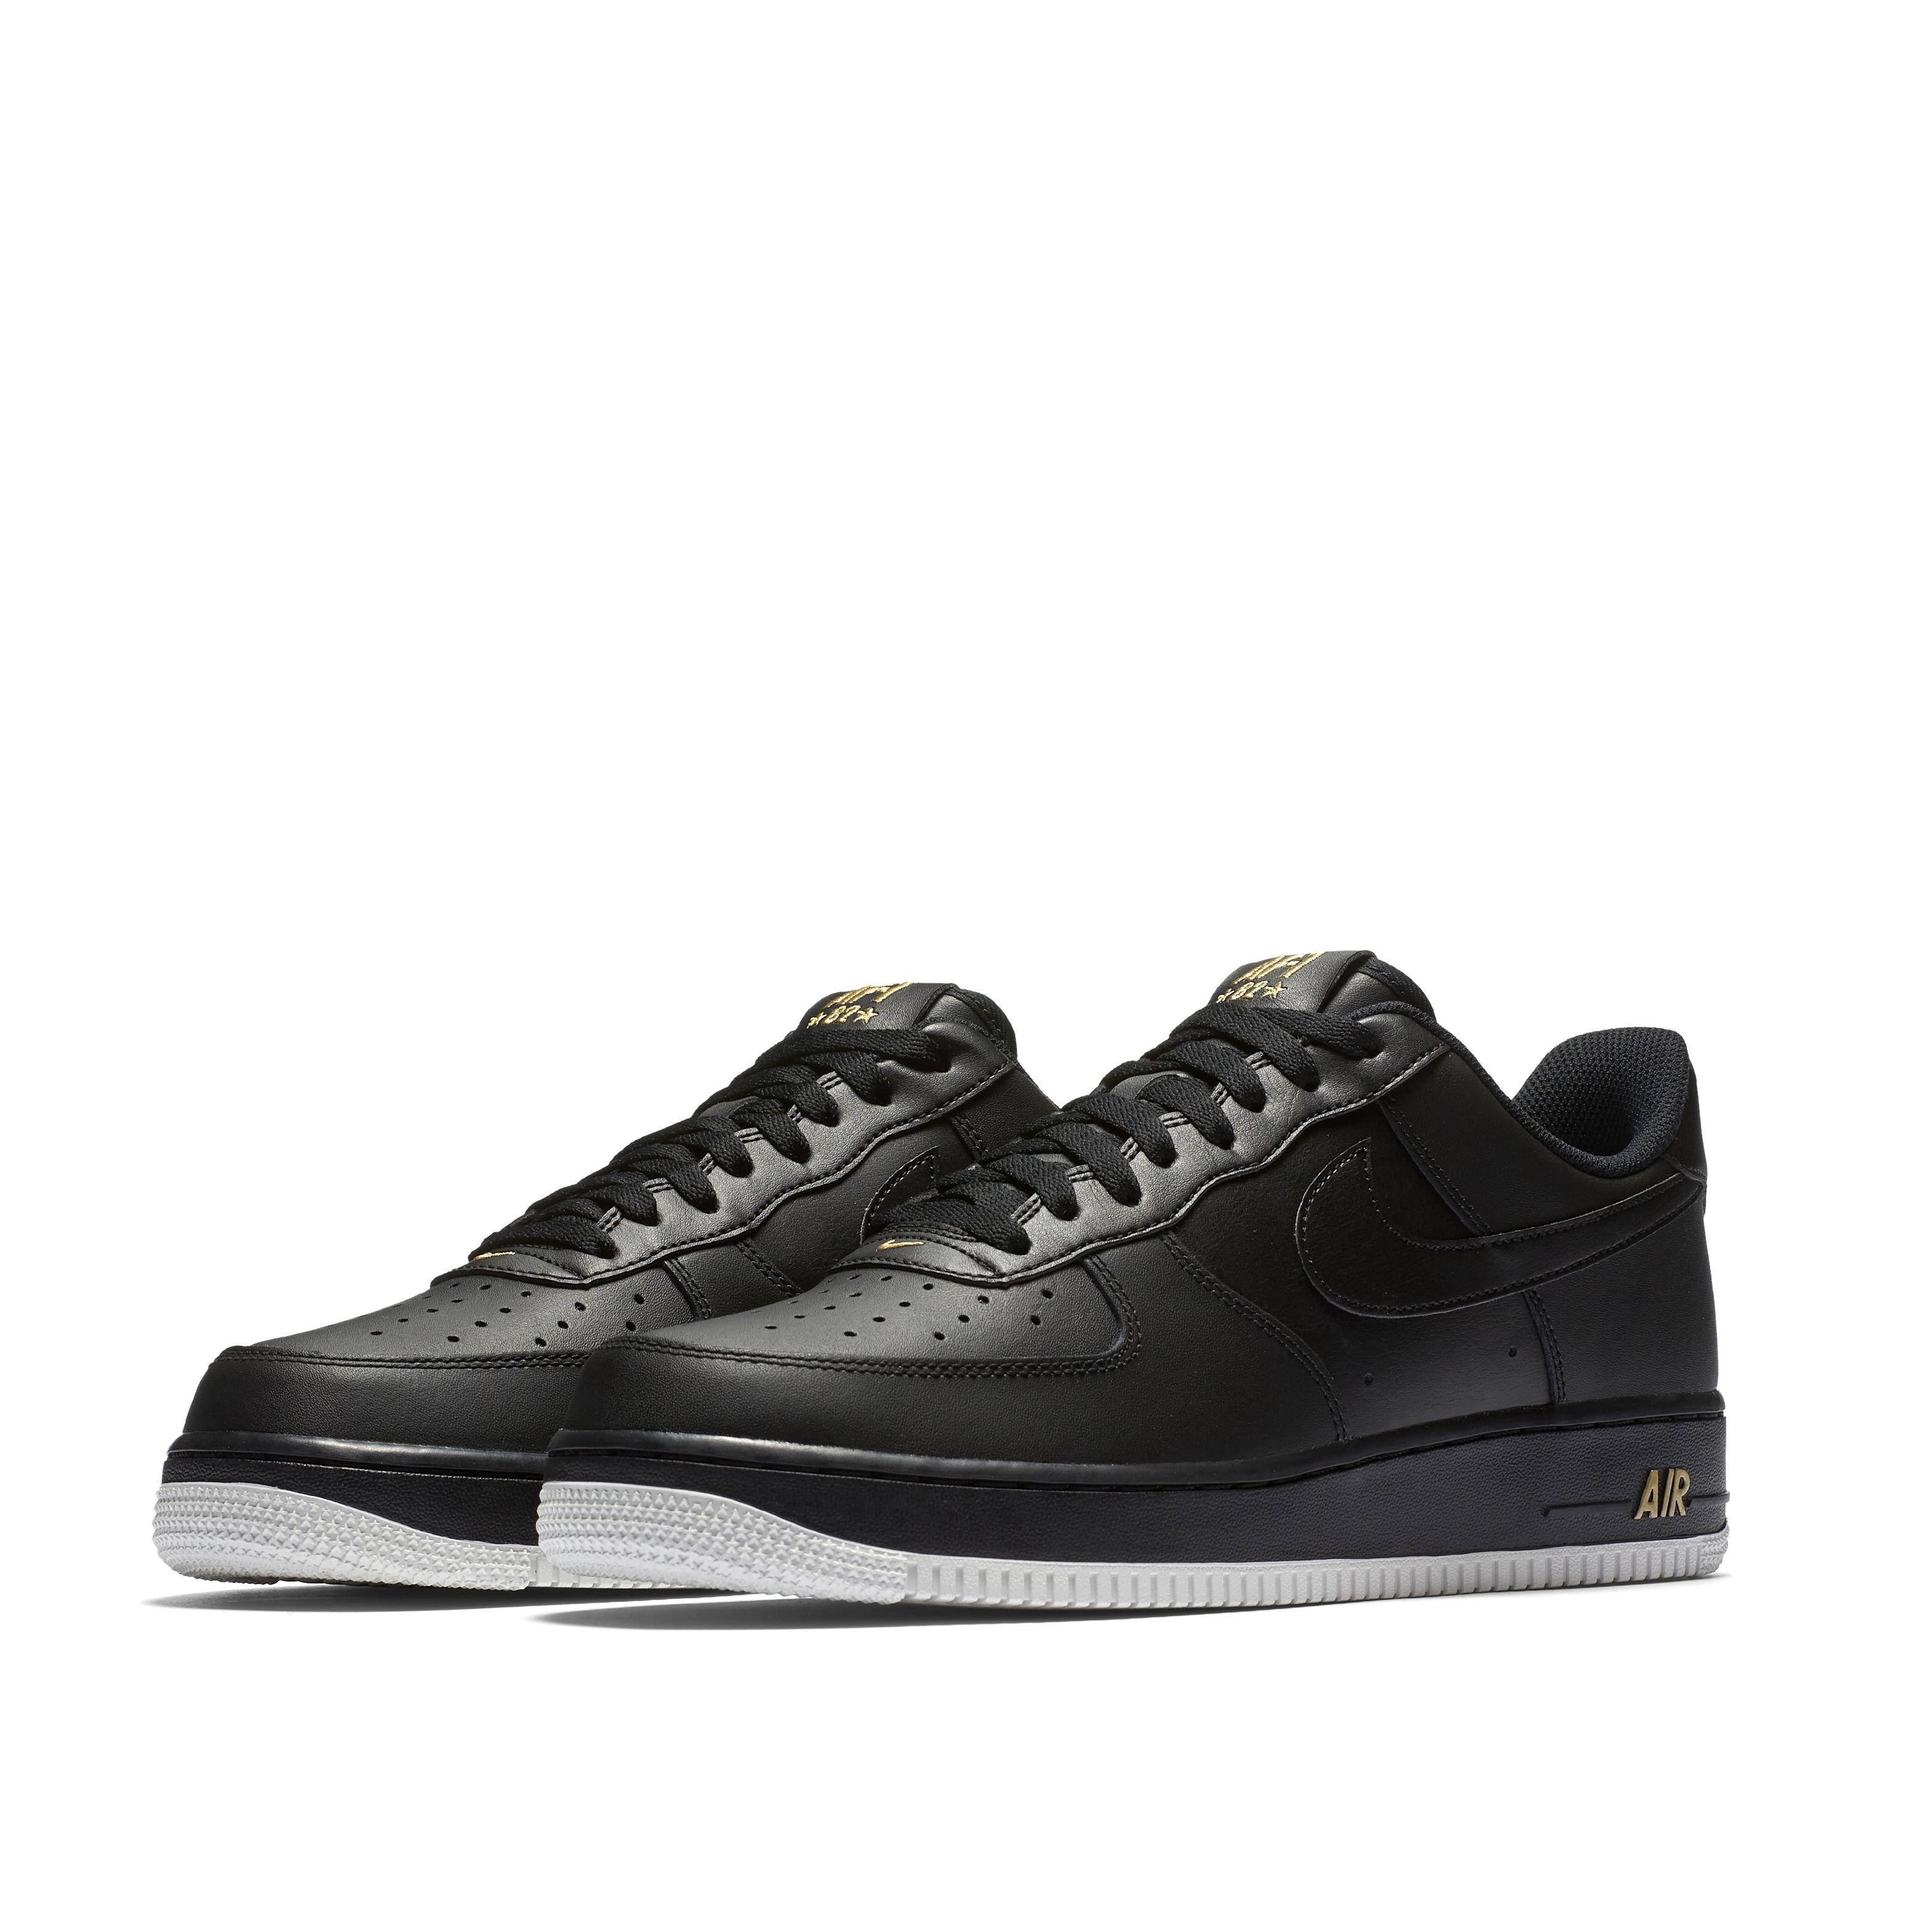 d71e7c3e Мужские кроссовки Nike Air Force 1 '07 Black/Black-Summit White-Metallic